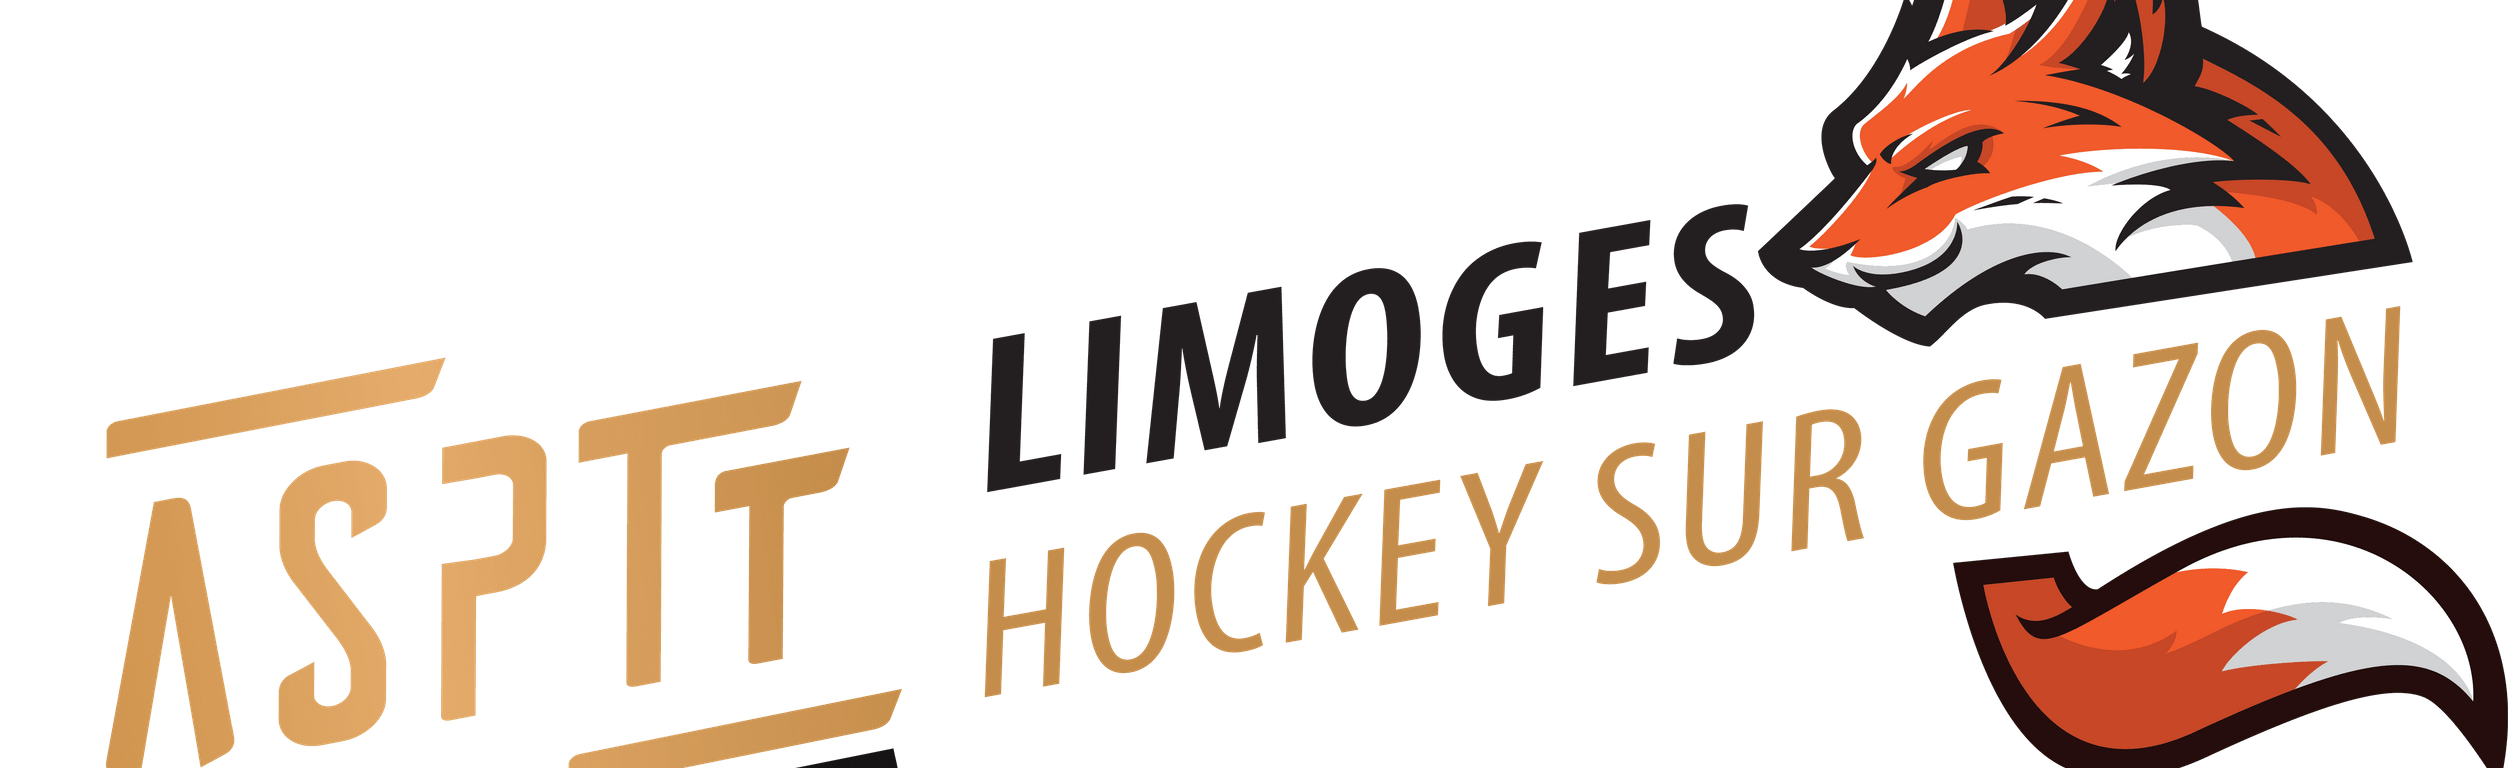 ASPTT Limoges Hockey sur gazon